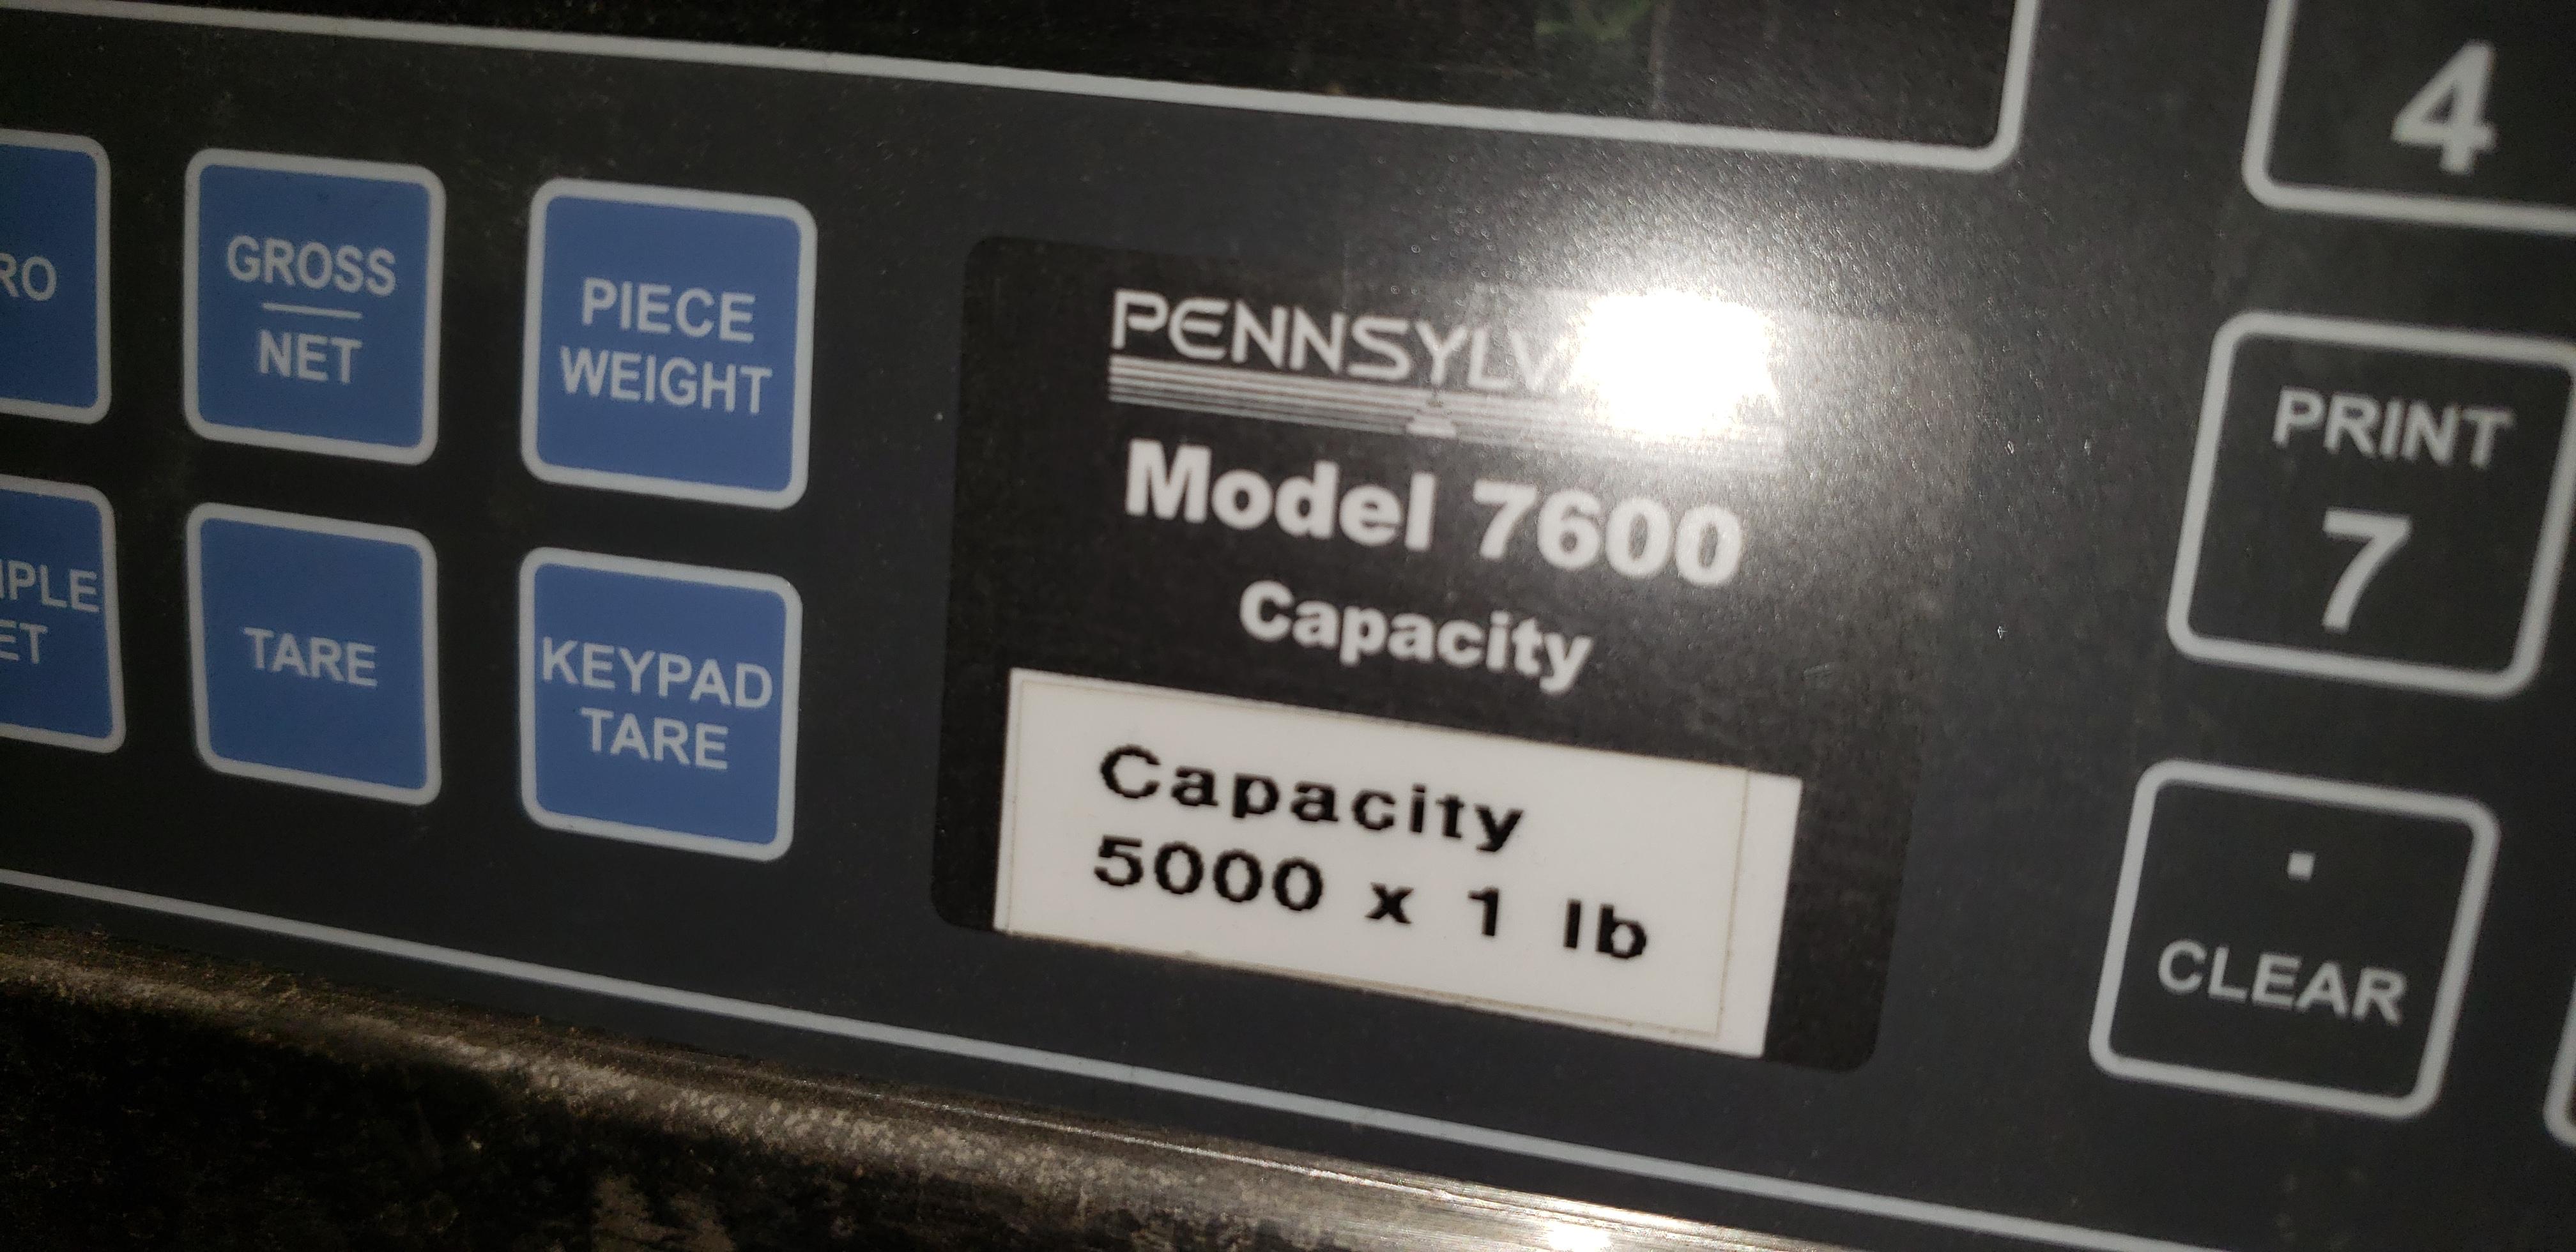 Pennsulvania 5000 Lb Capacity platform scale - Image 3 of 3